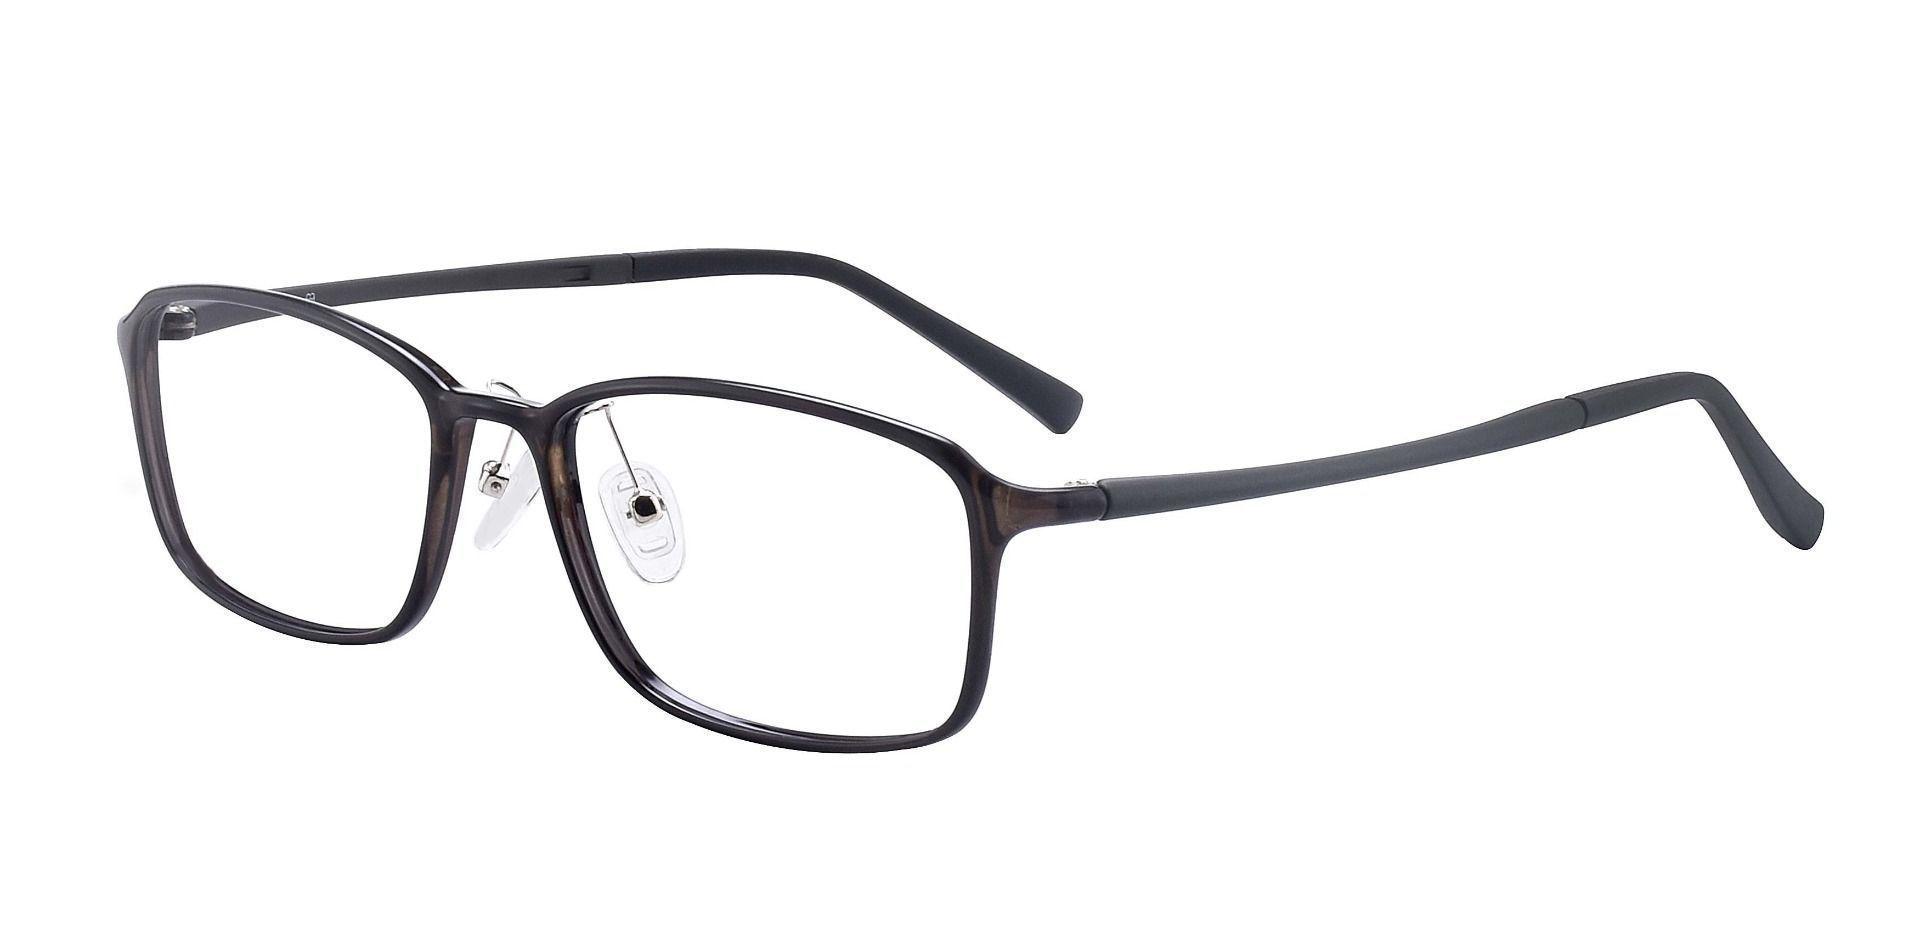 Brahm Rectangle Prescription Glasses - Gray